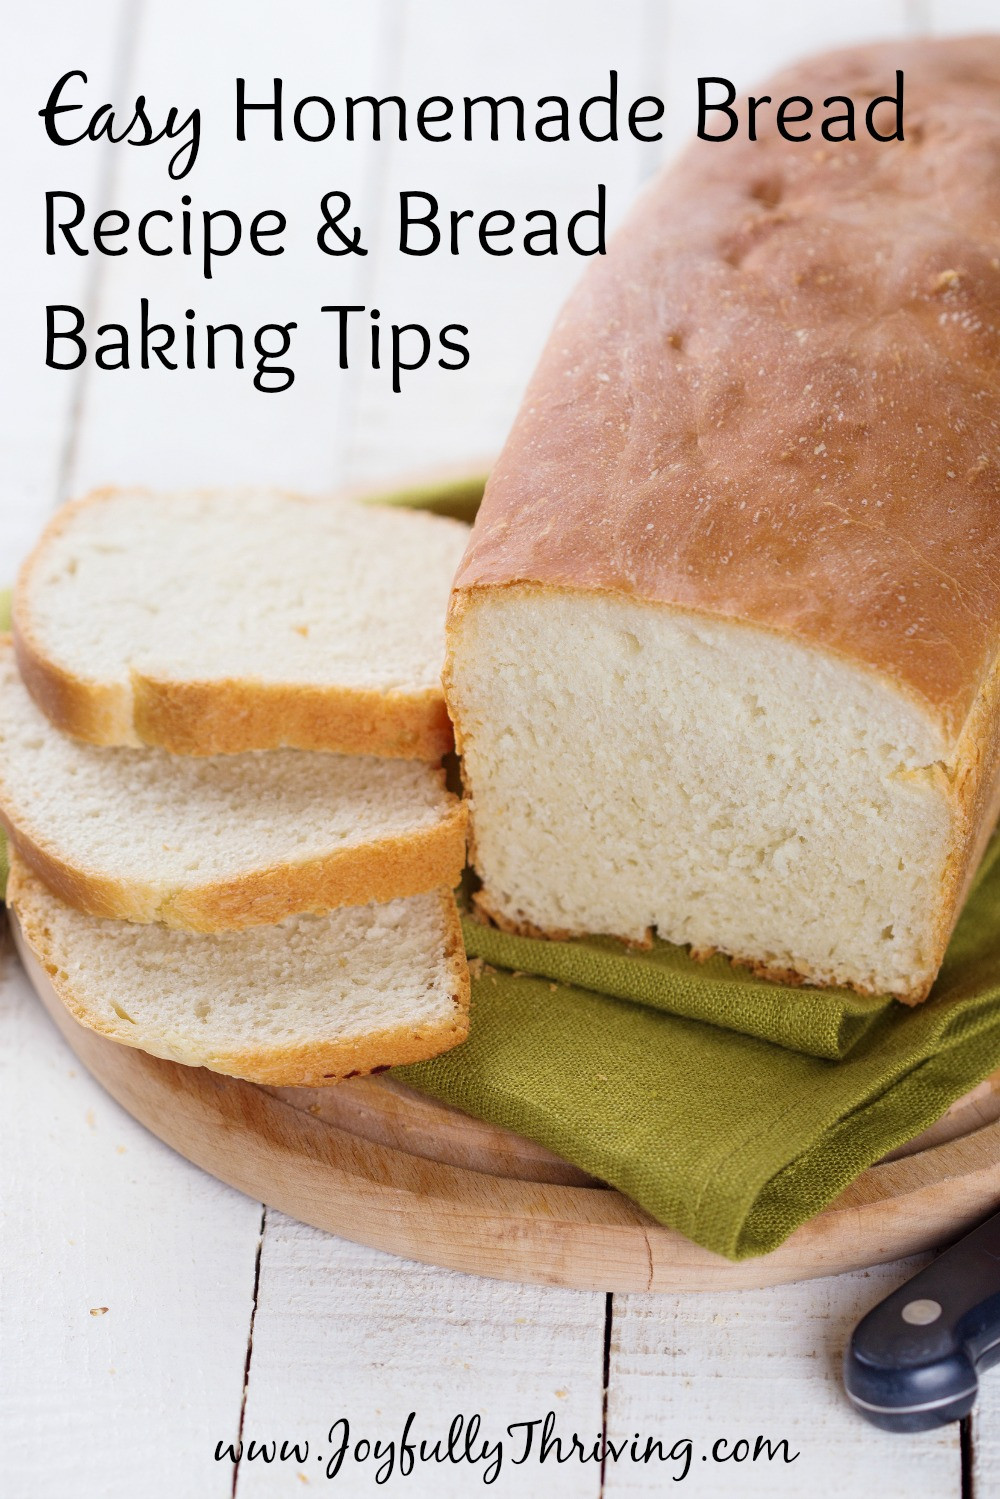 Easy Homemade Bread Recipe  Homemade Bread Recipe & Tips